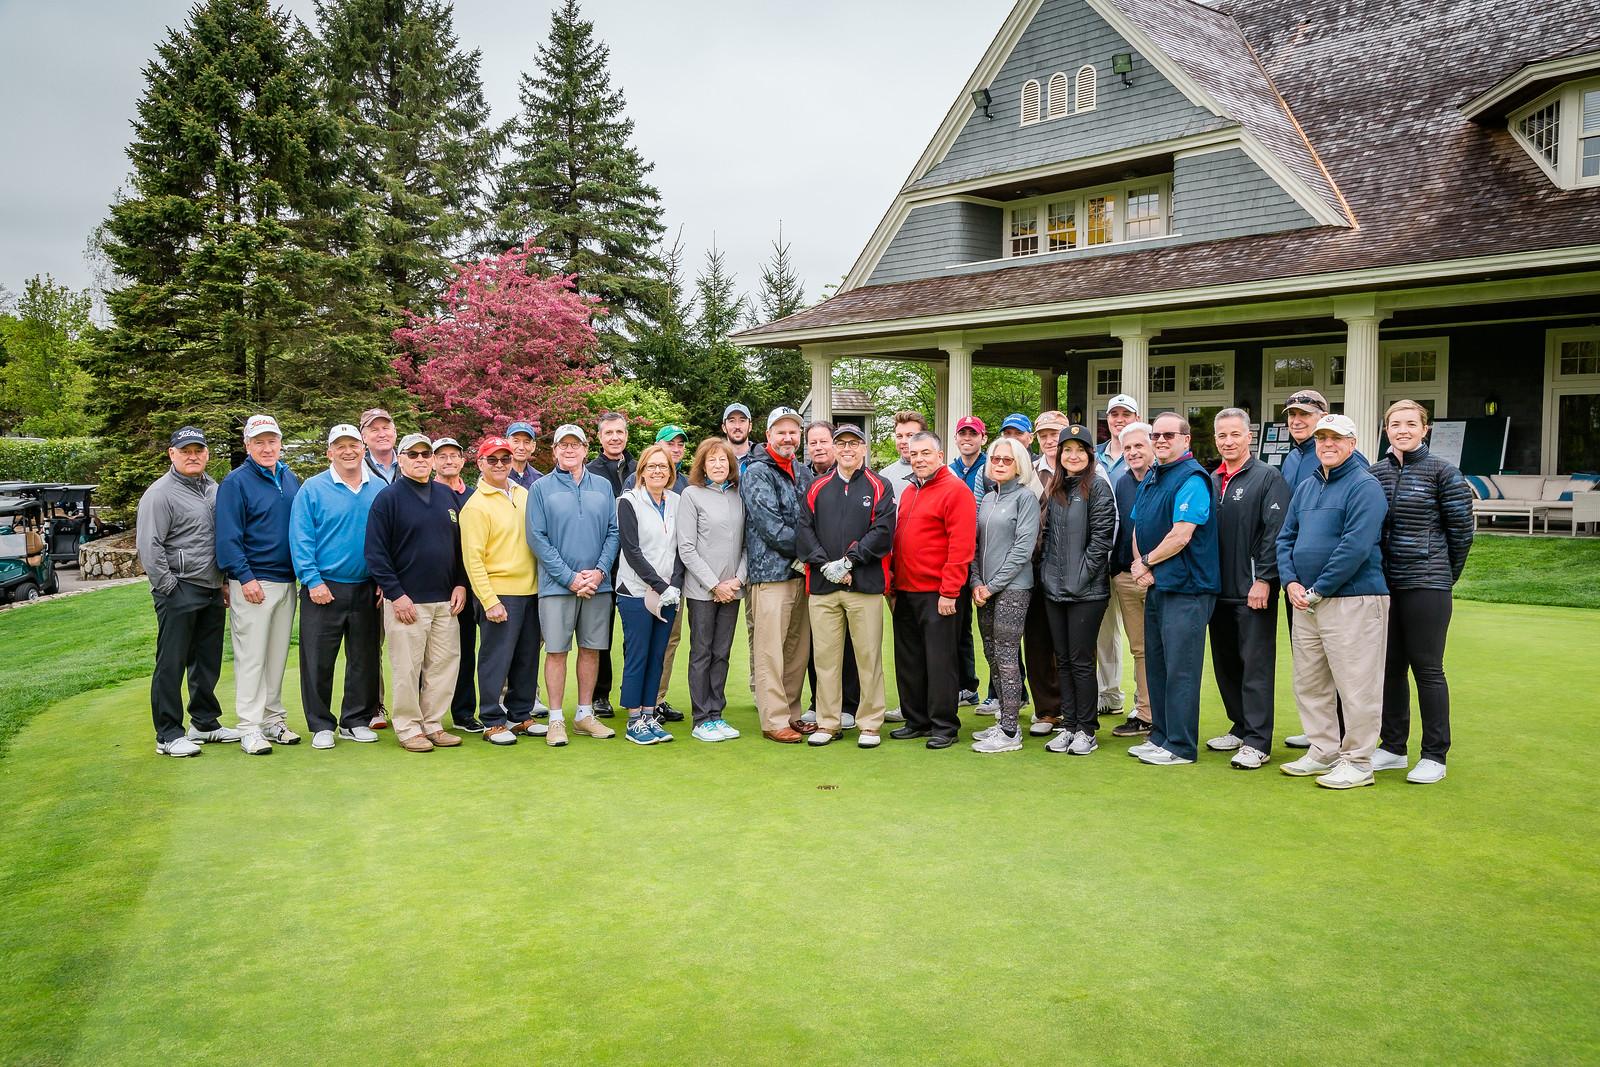 Golf-group-photo.jpg